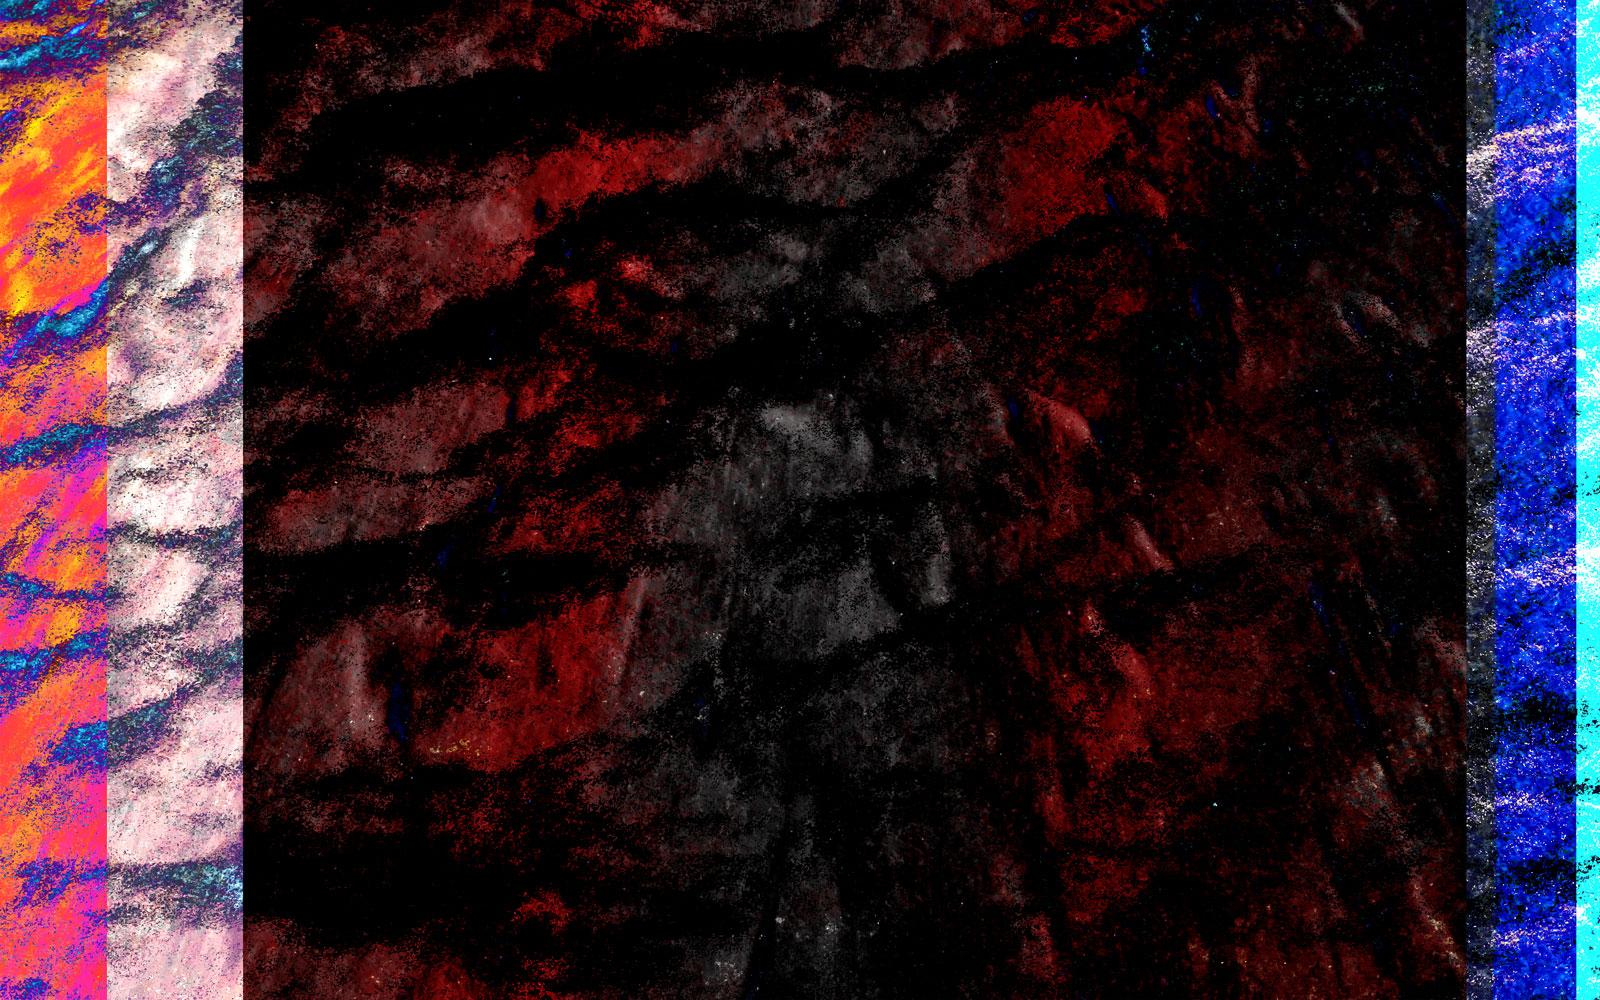 Elemental Frost N01 - Forrest • 120 x 75 cm (47.2 x 29.53 in)